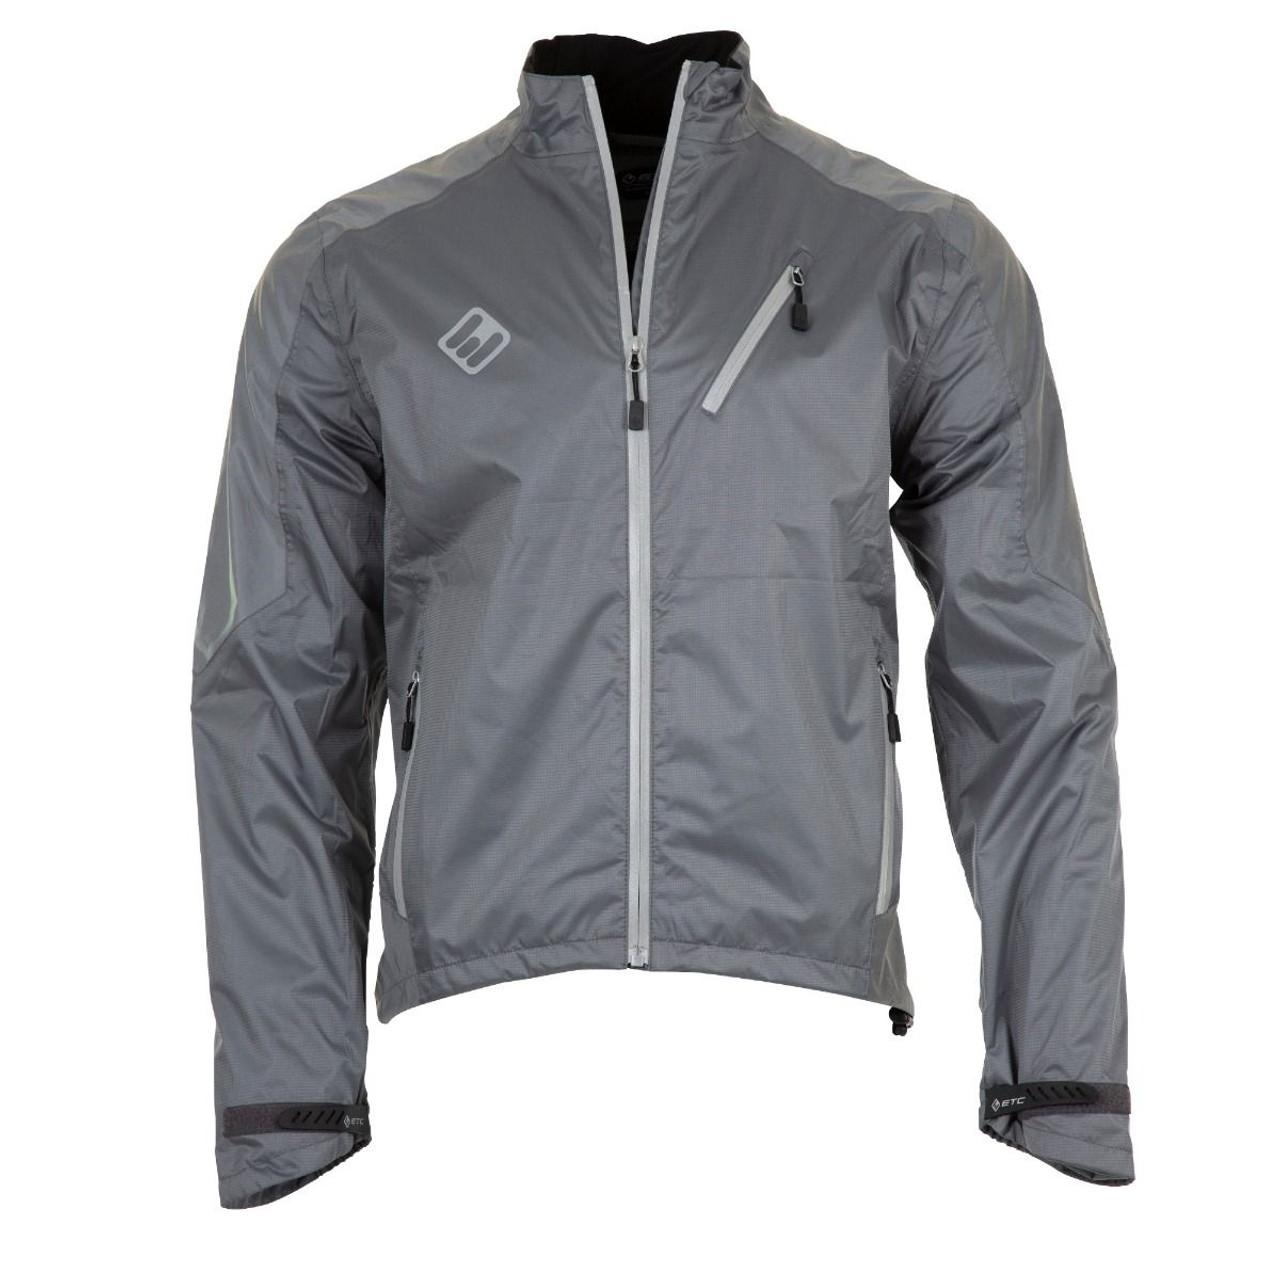 ETC Arid Force 10 Rain Jacket Mens - All Sizes